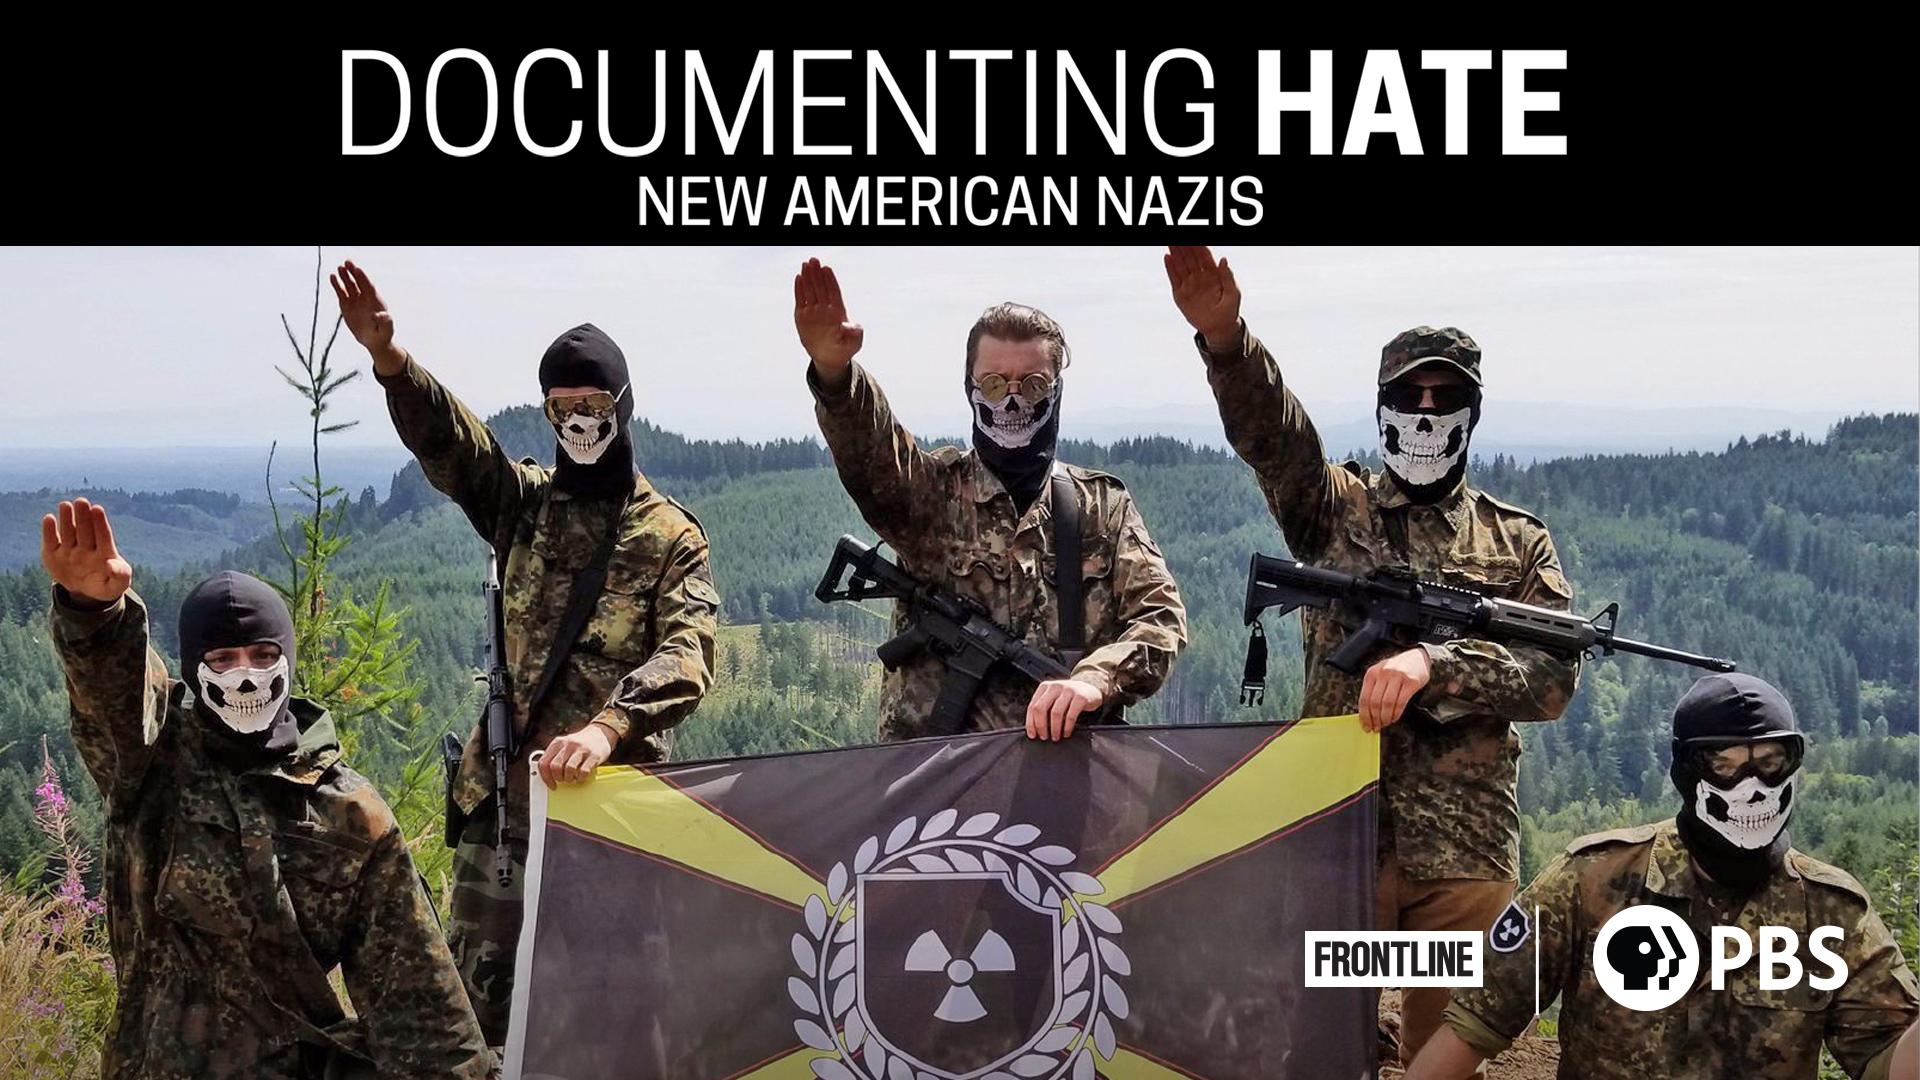 Documenting Hate: New American Nazis